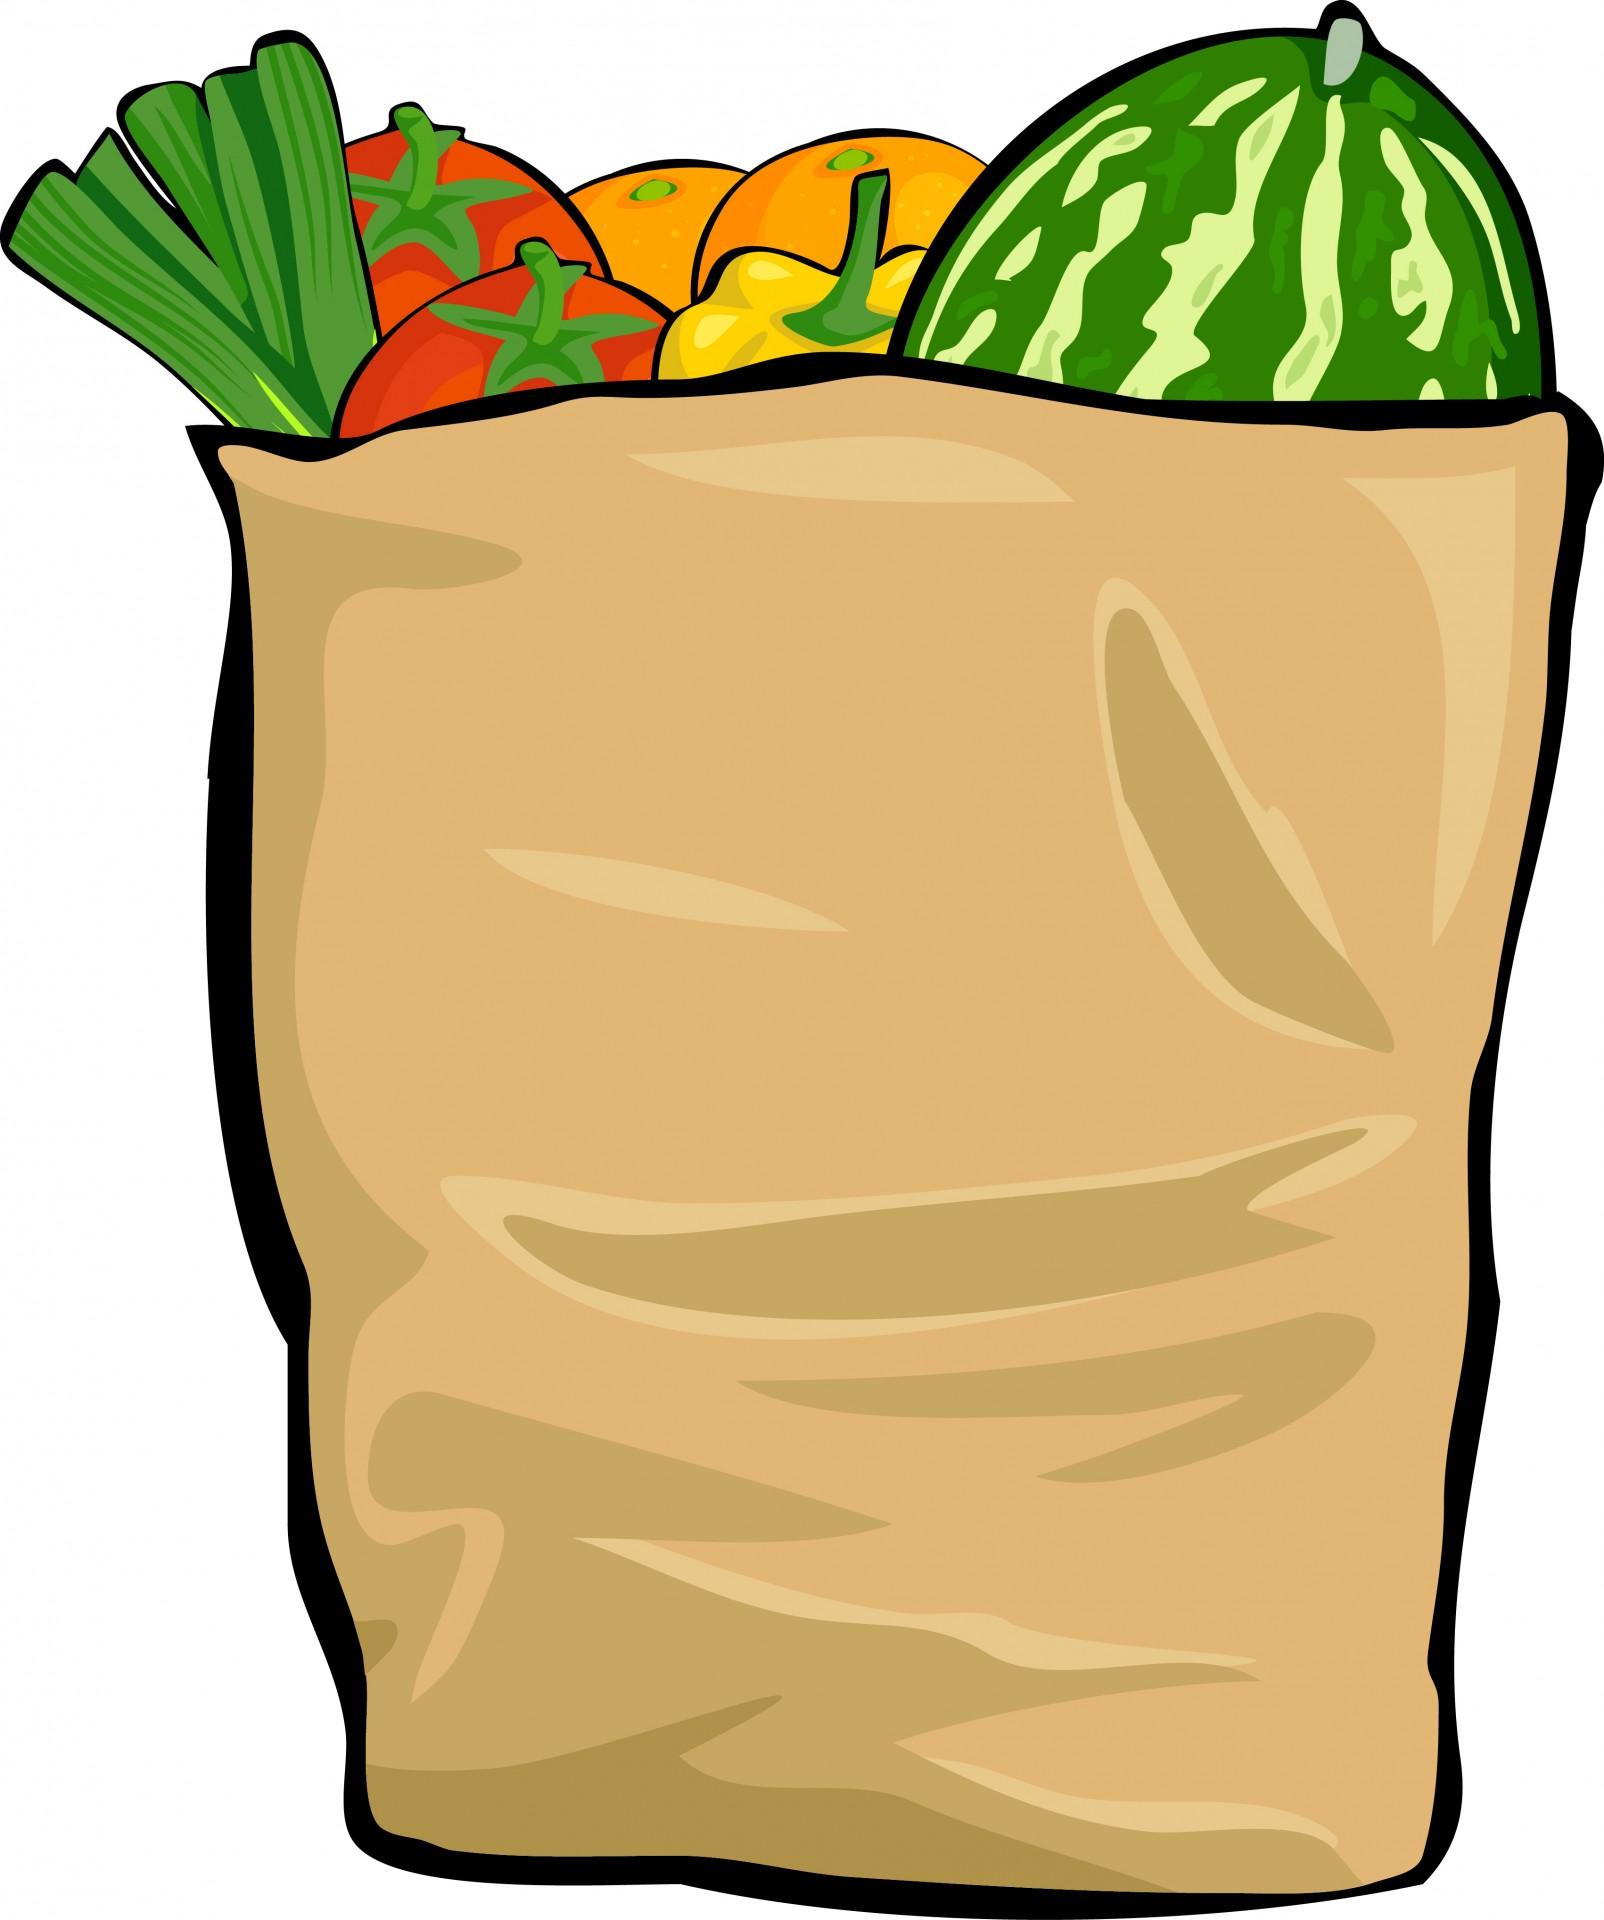 1604x1920 Grocery Bag Free Stock Photo